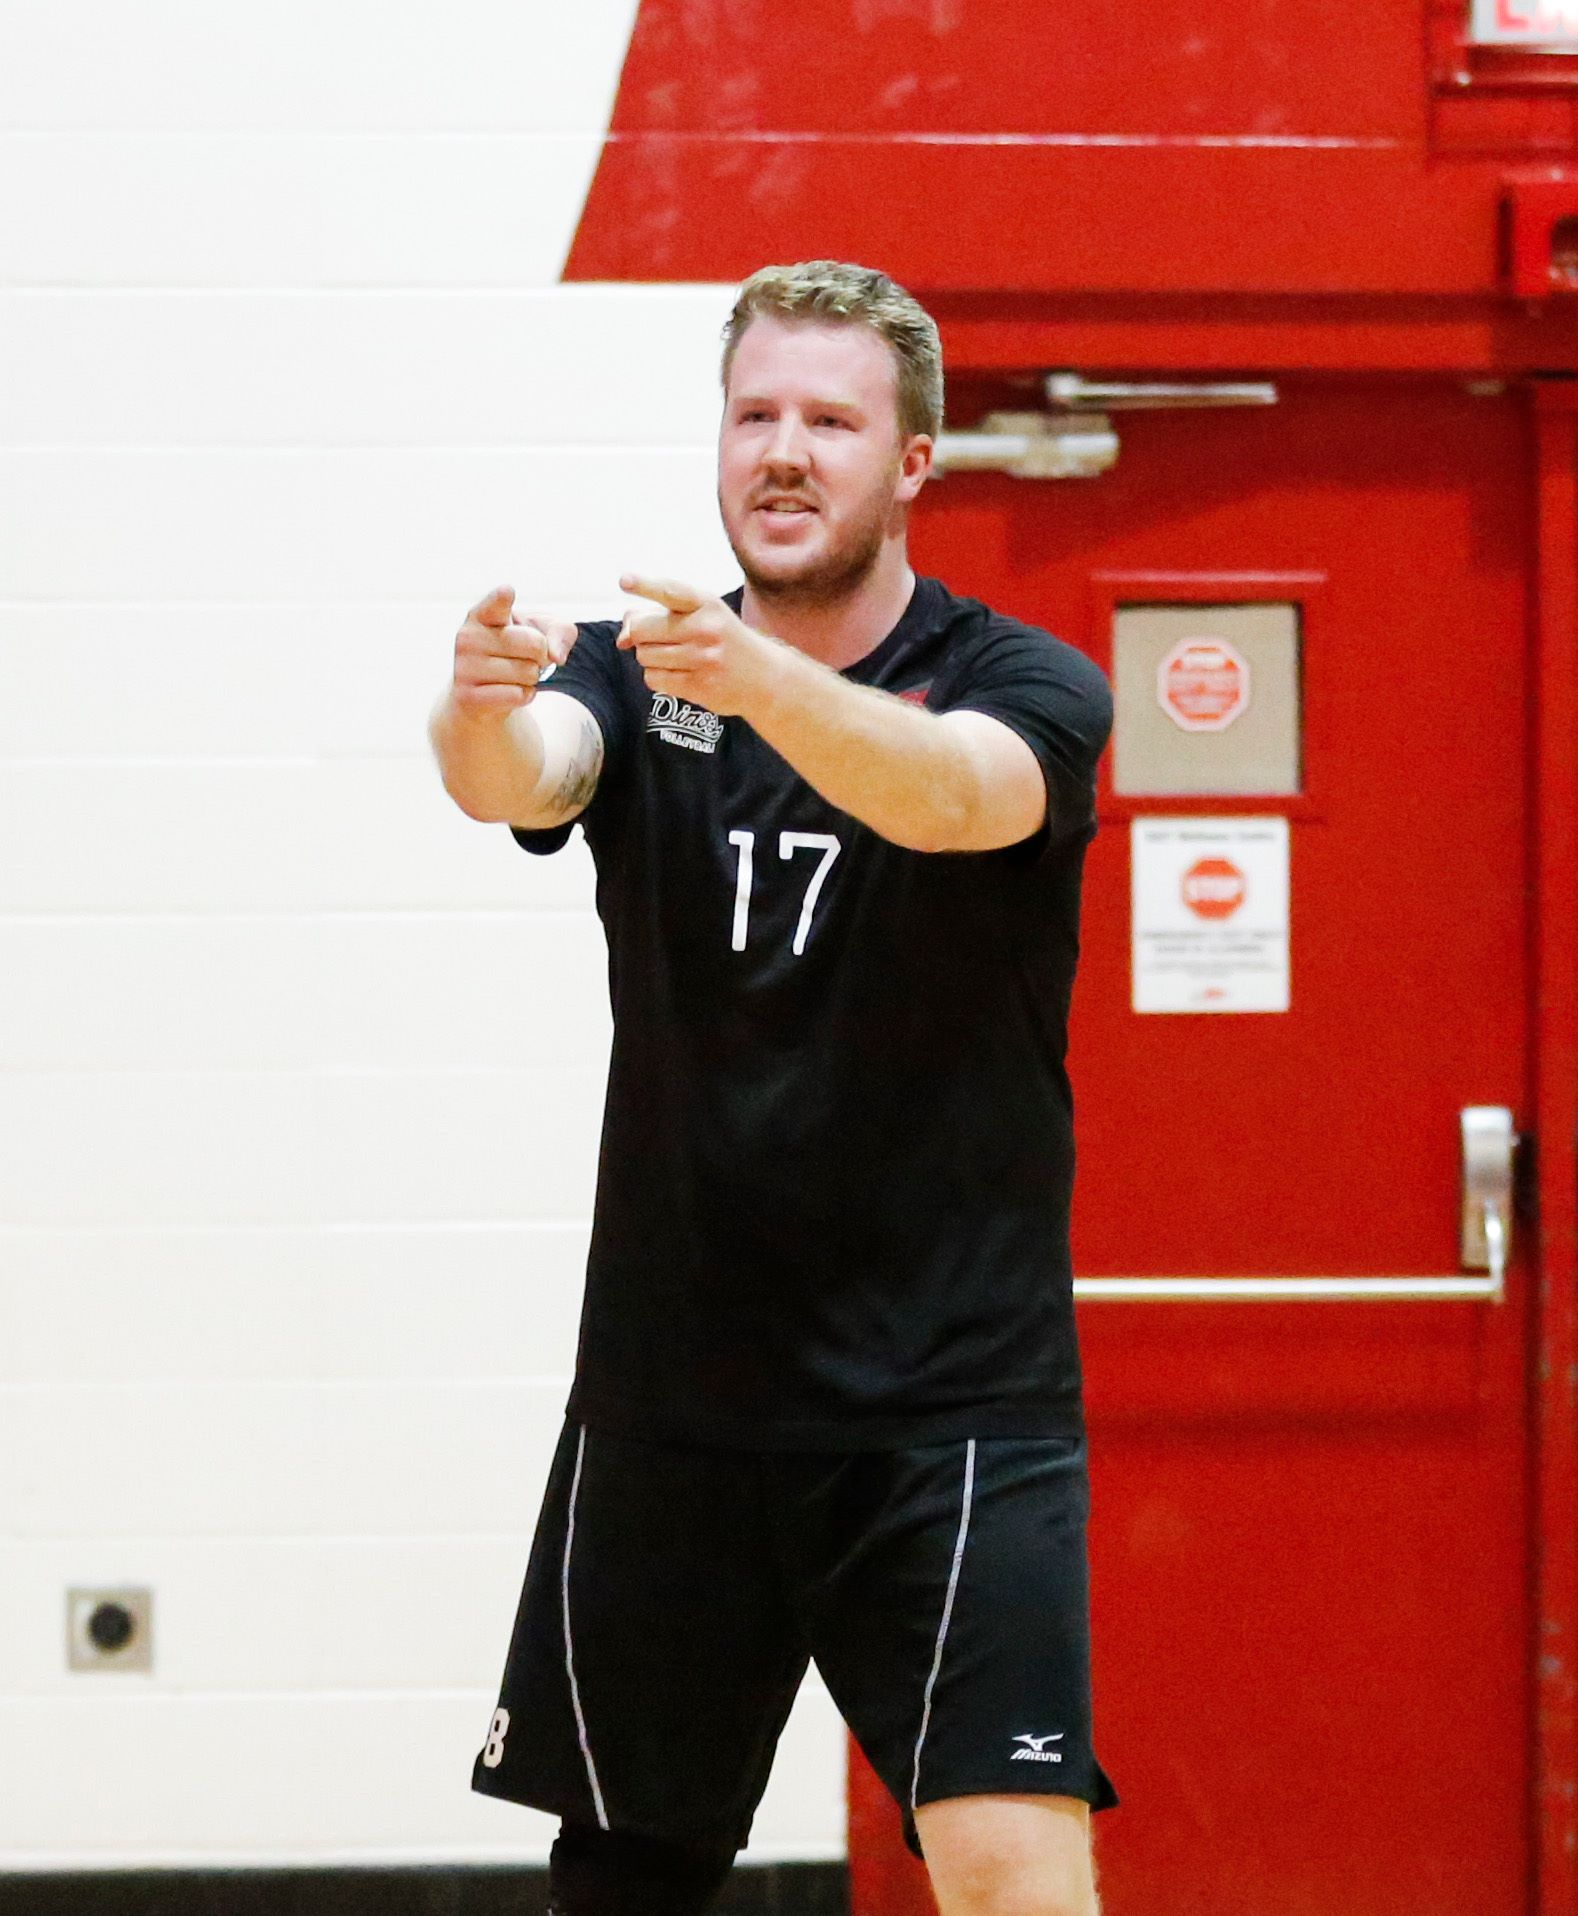 Alex Cook 2018 team: Dino's Volleyball